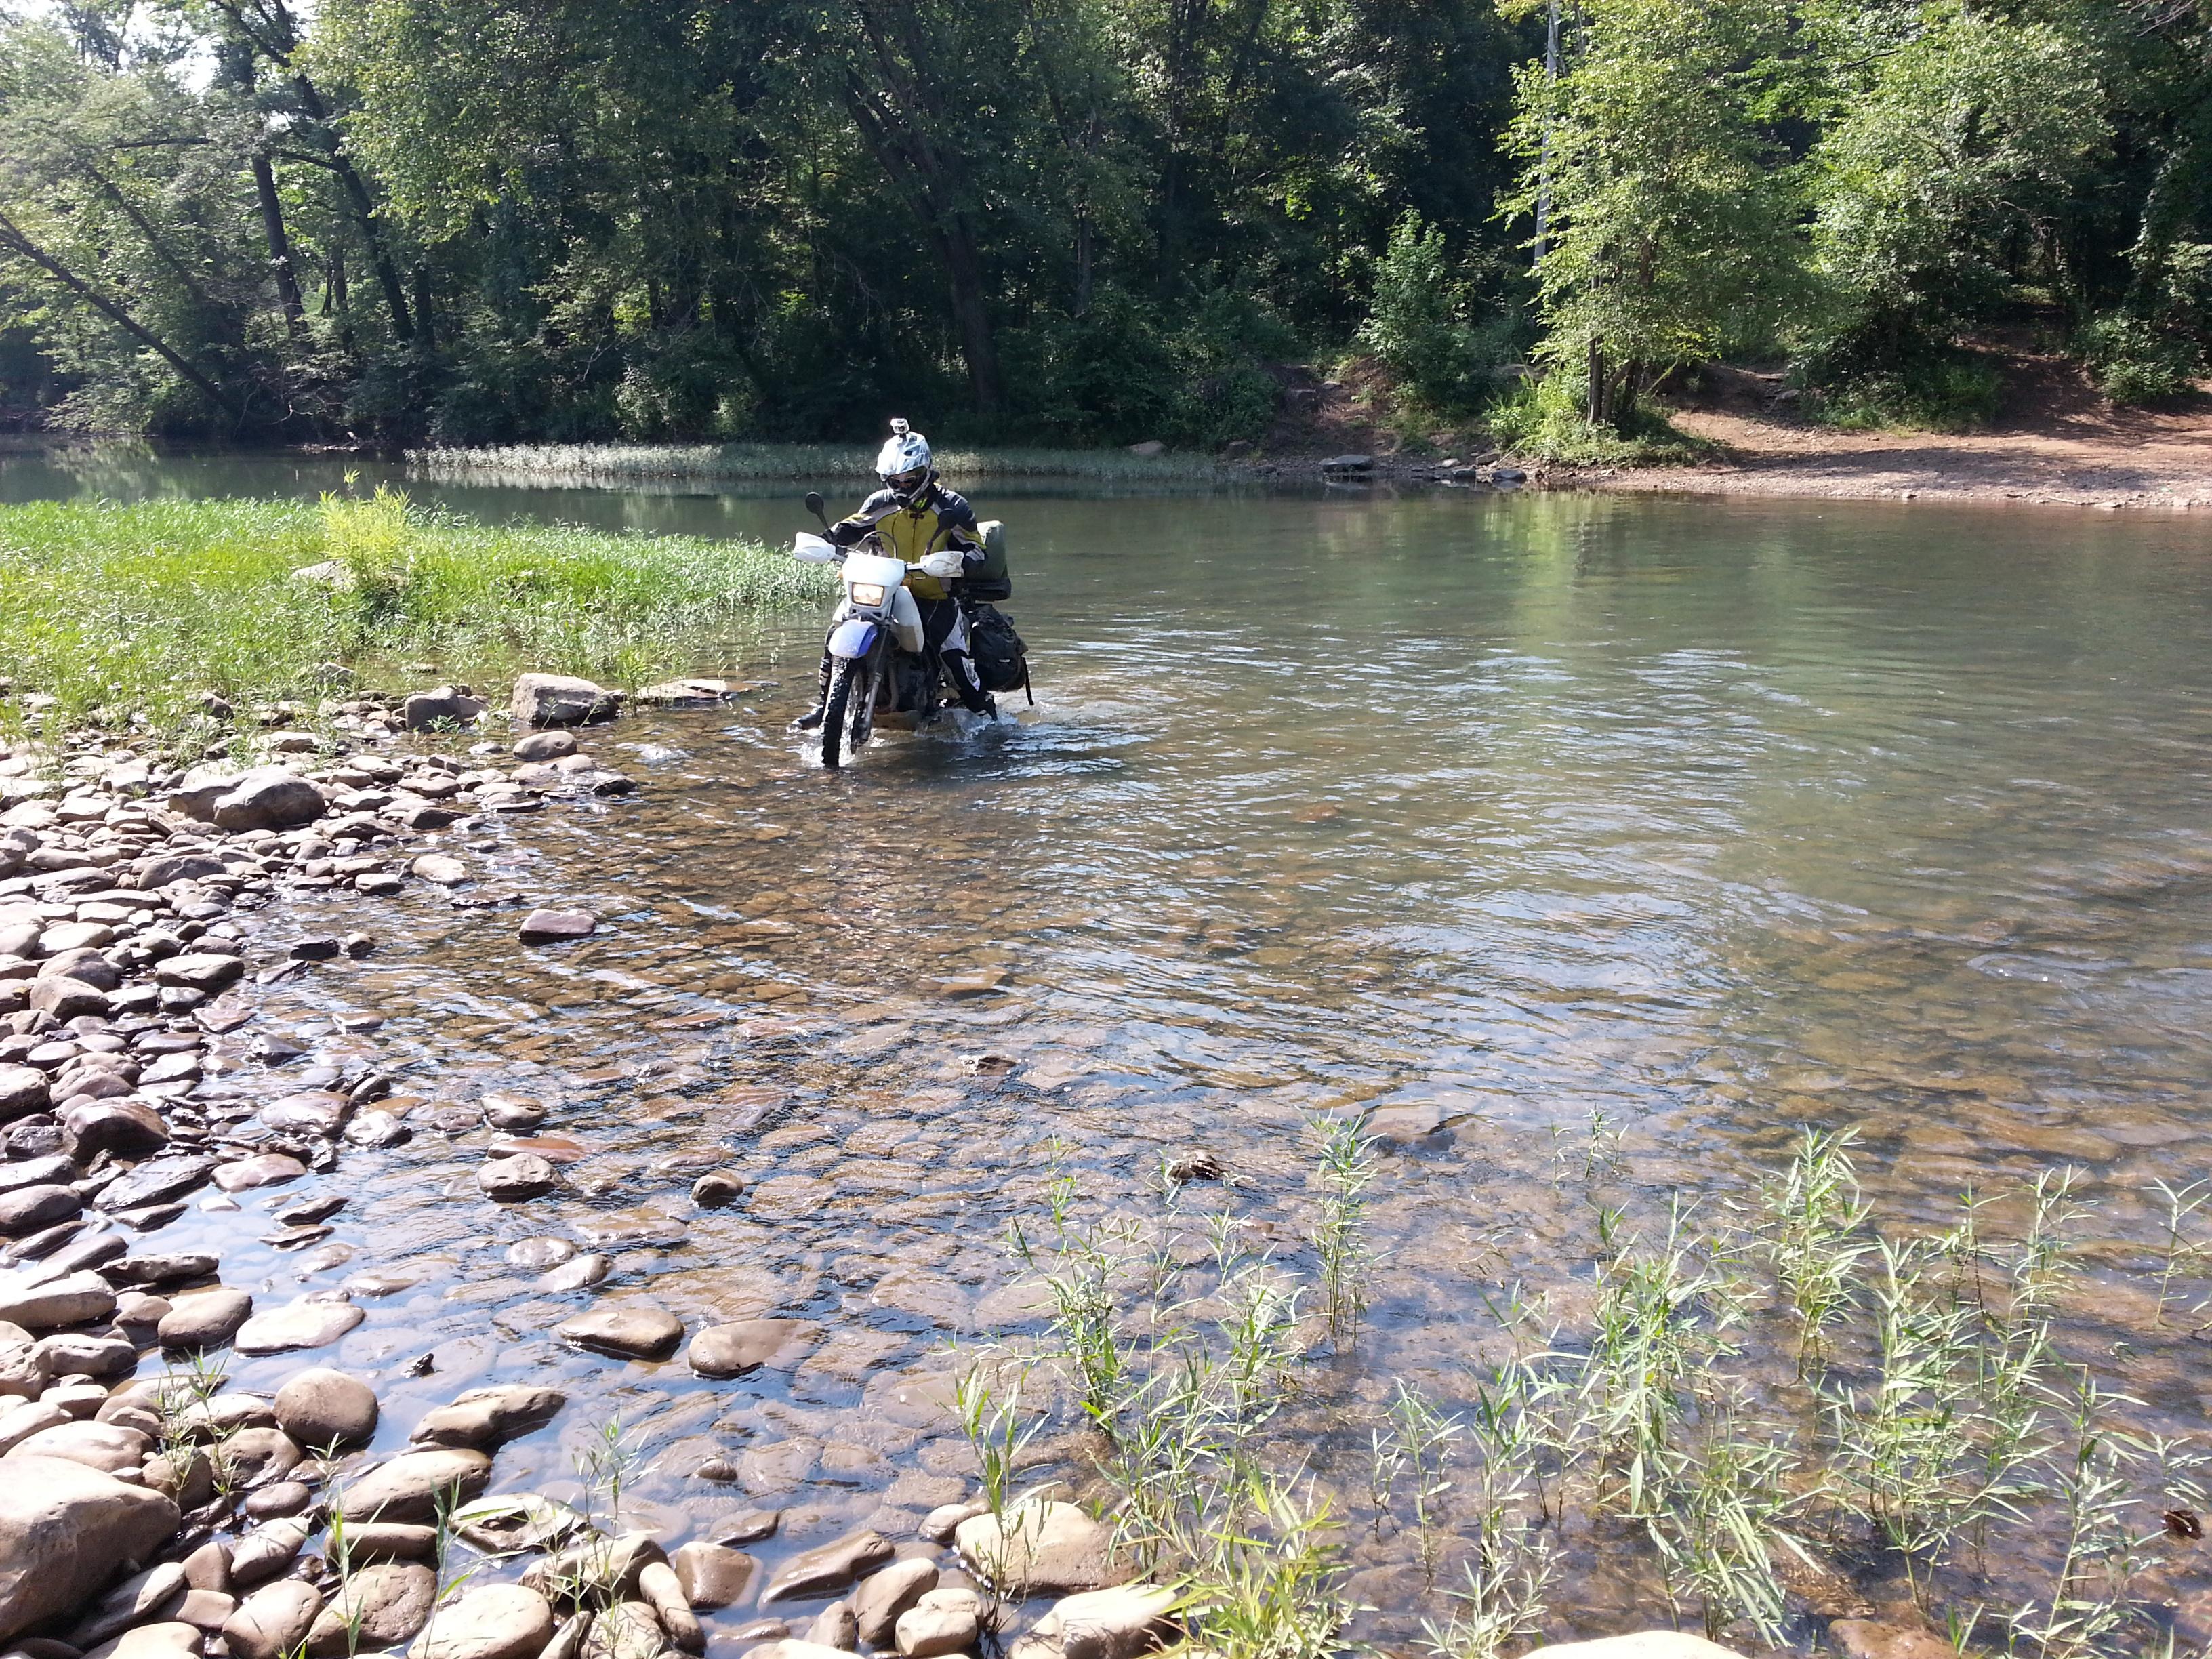 me crossing the creek